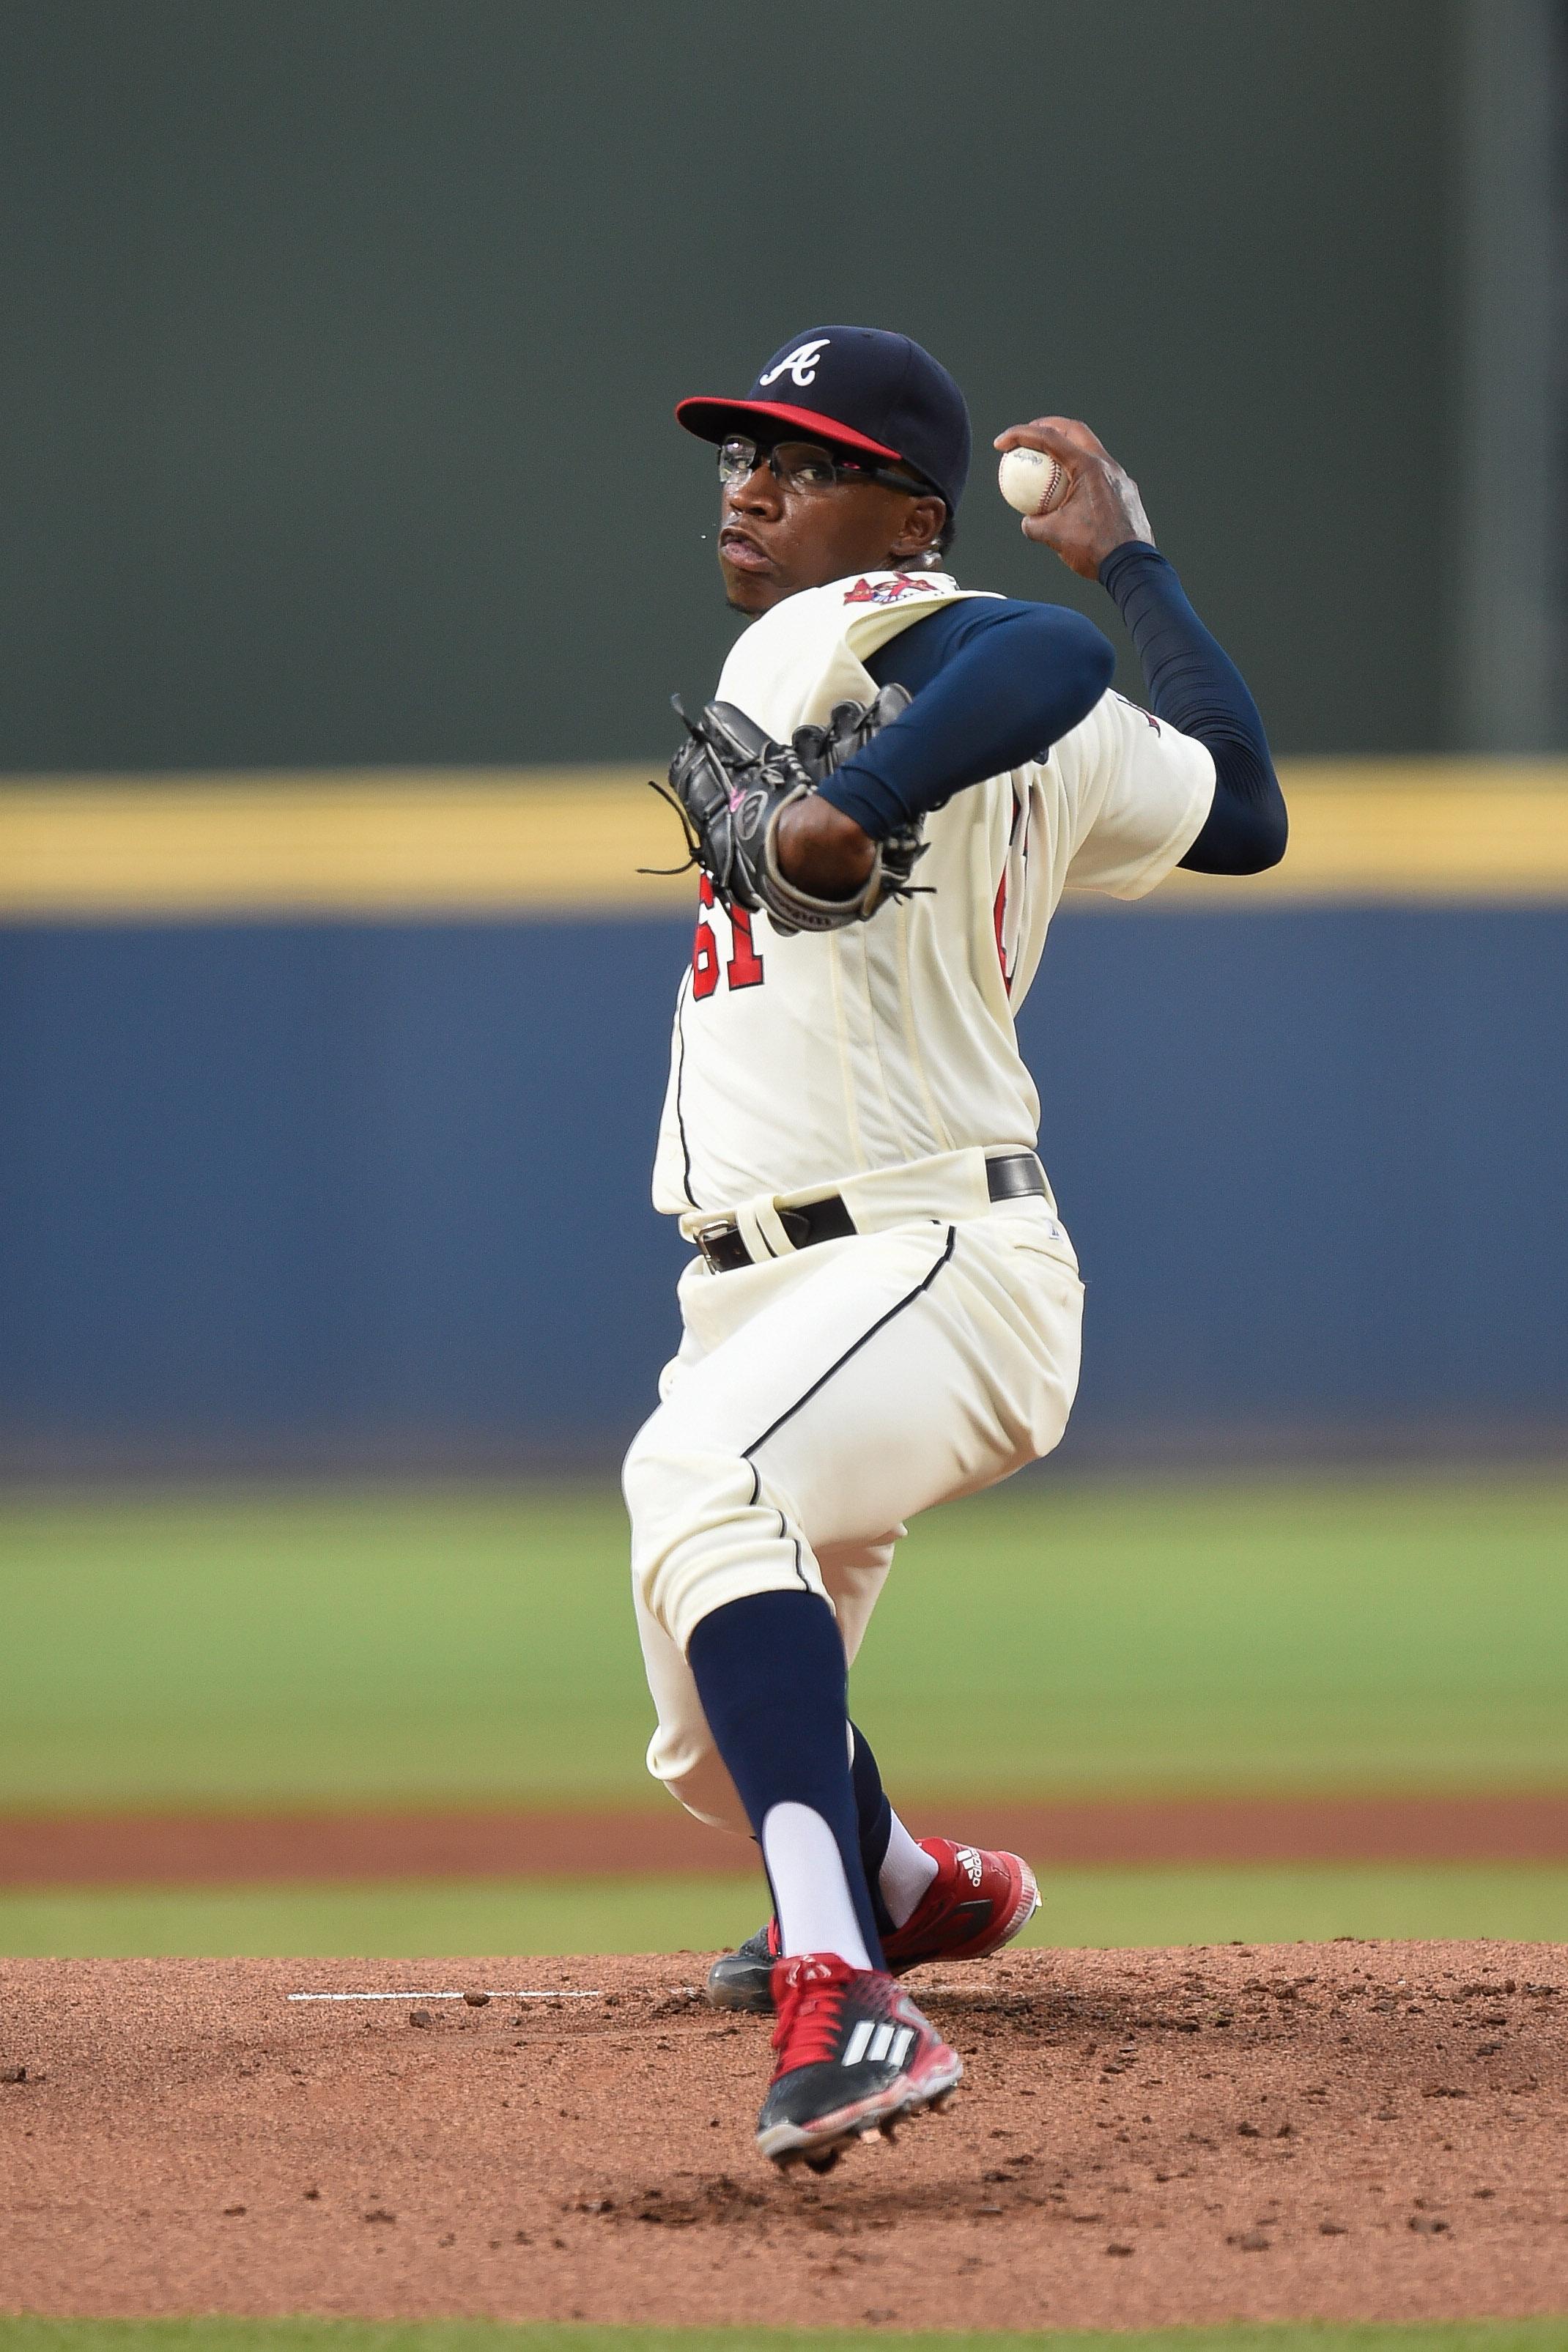 Rangers Acquire Tyrell Jenkins Brady Feigl From Braves For Luke